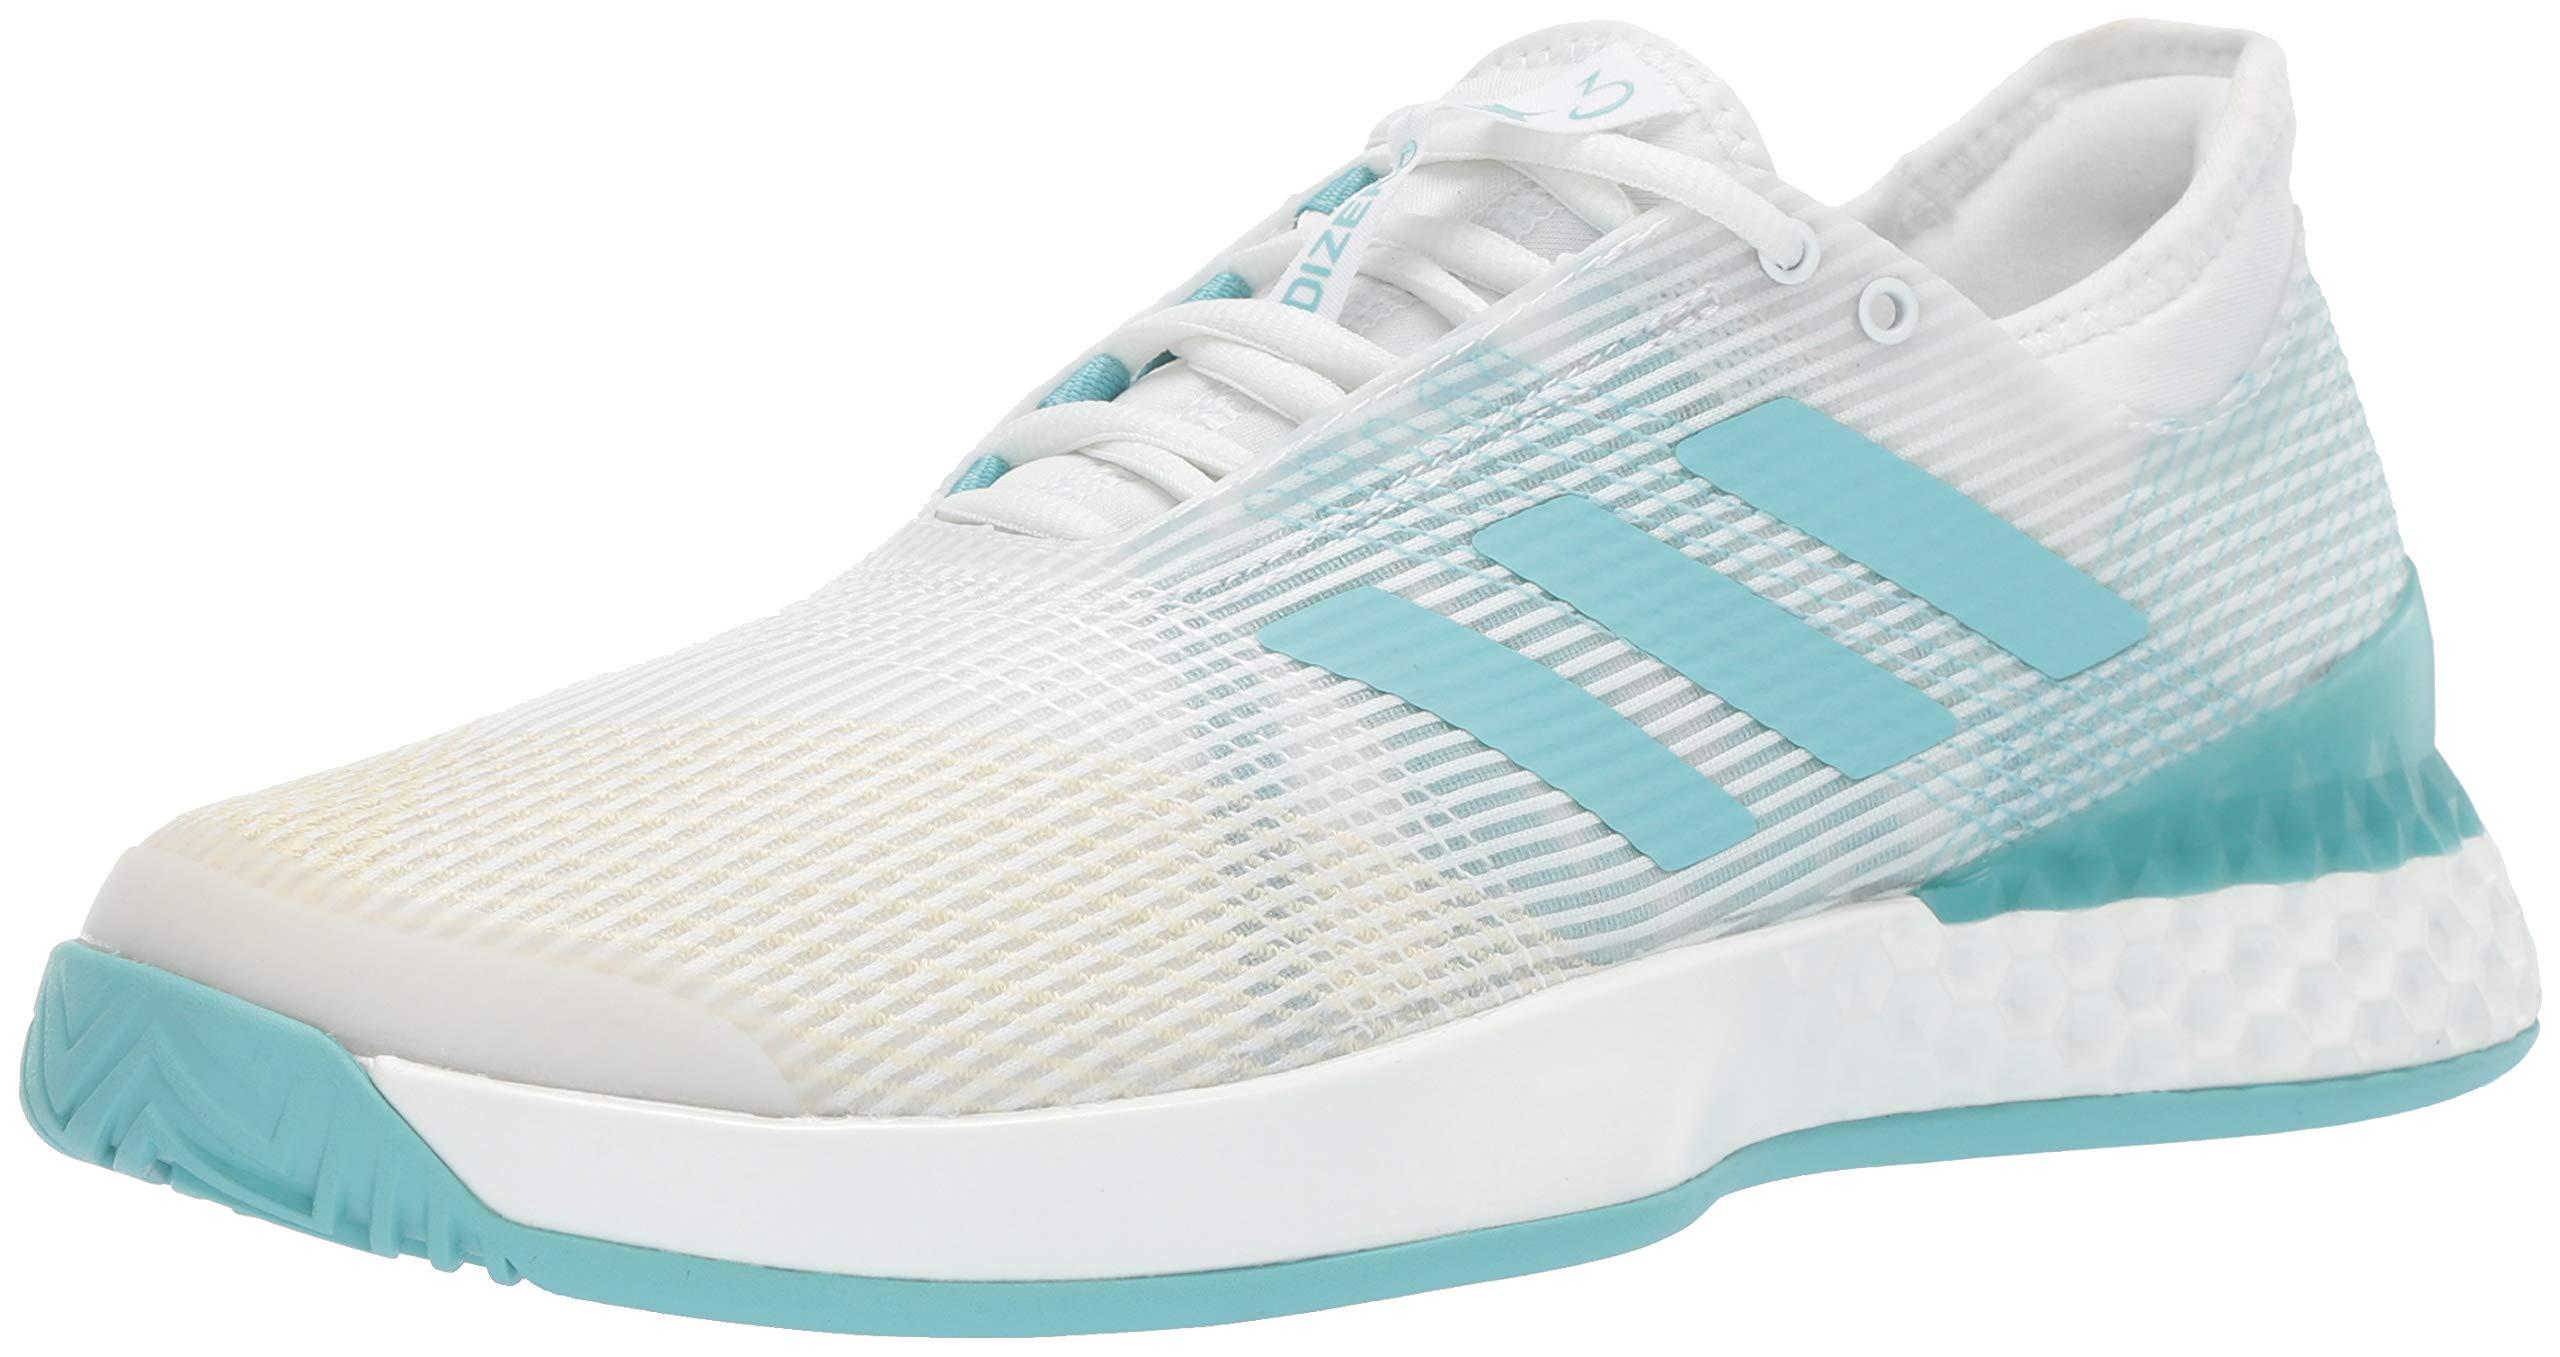 adidas Men's Adizero Ubersonic 3, Blue Spirit/White, 6.5 M US